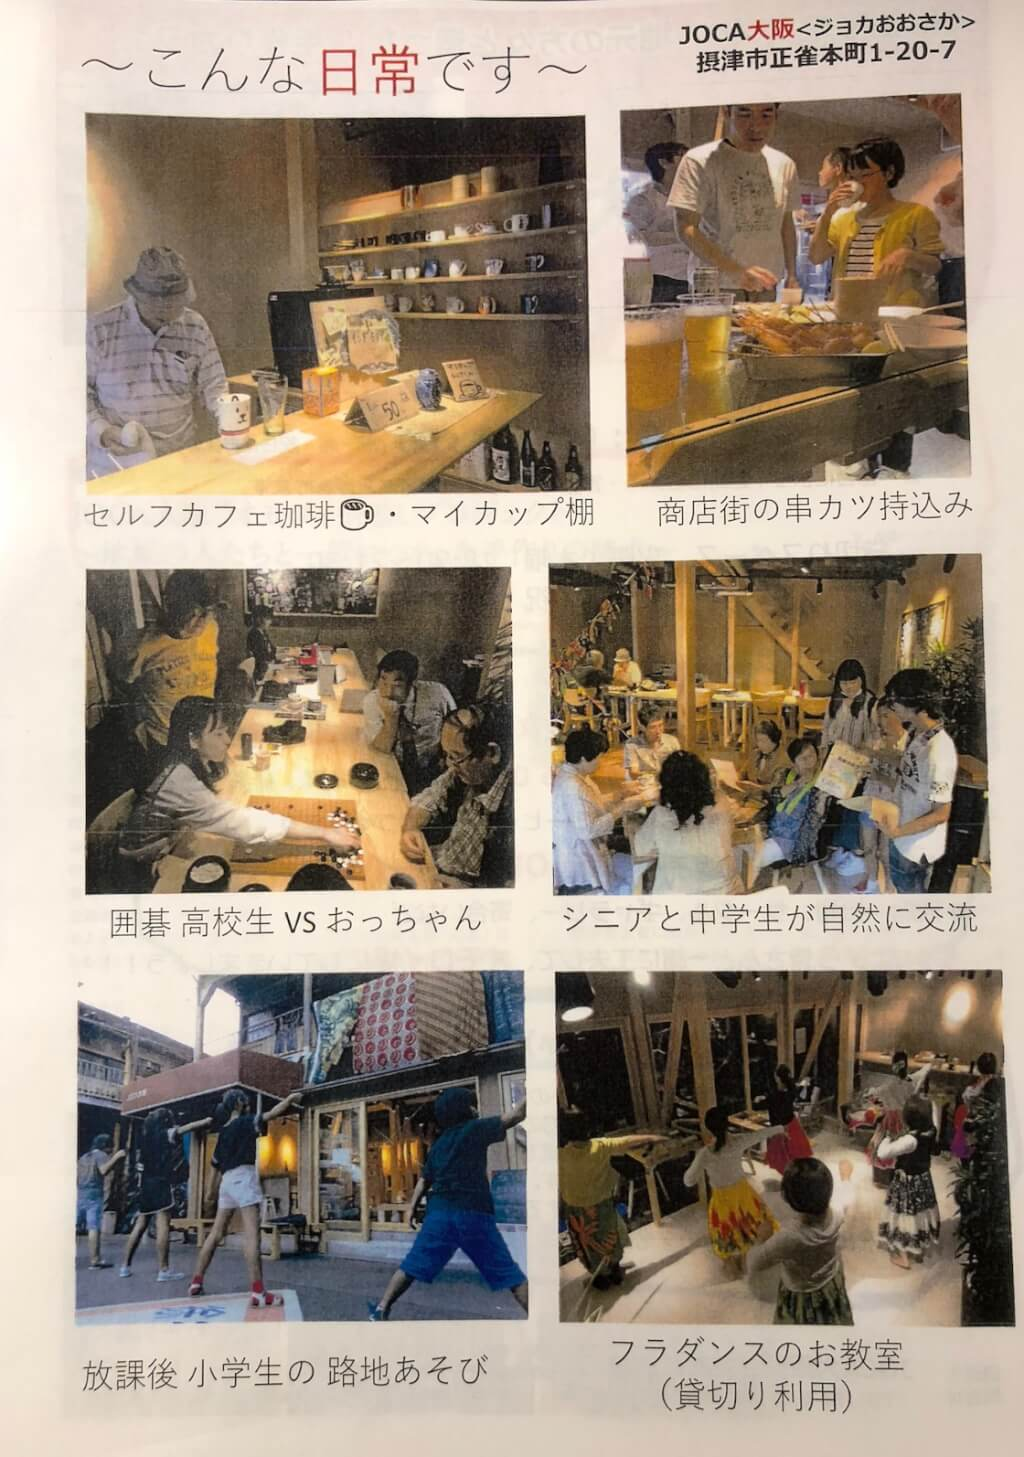 JOCA大阪を活用する人たち